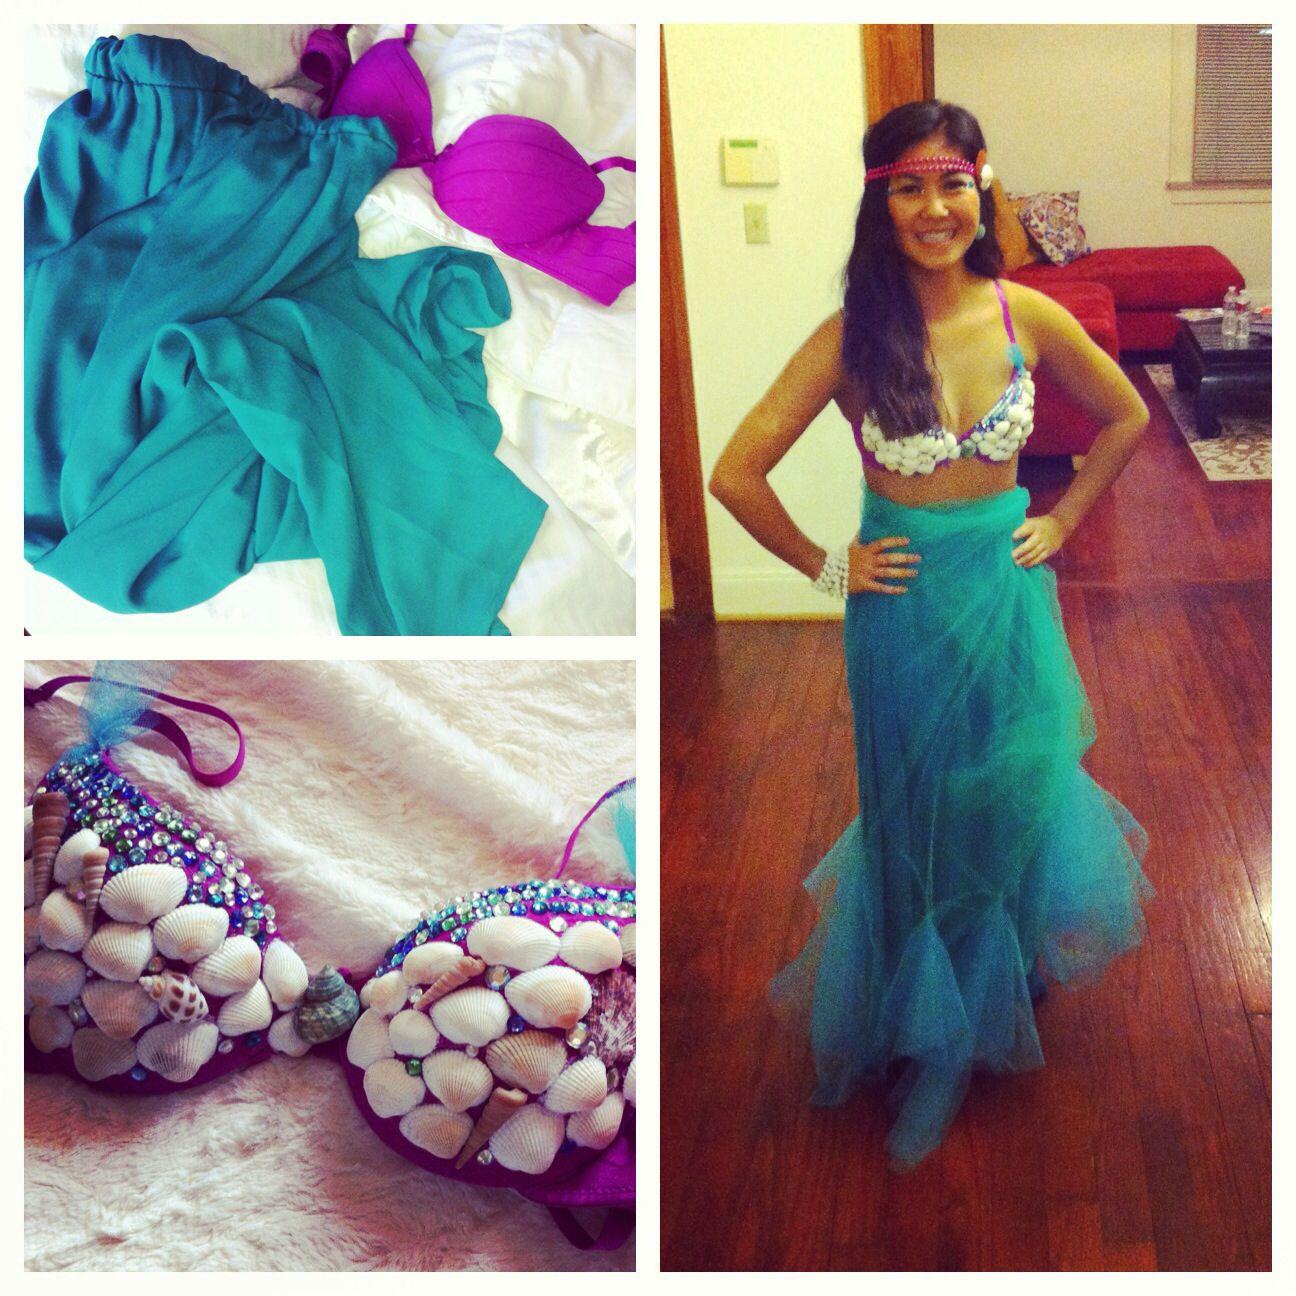 diy mermaid costume seashells glued to bra green and